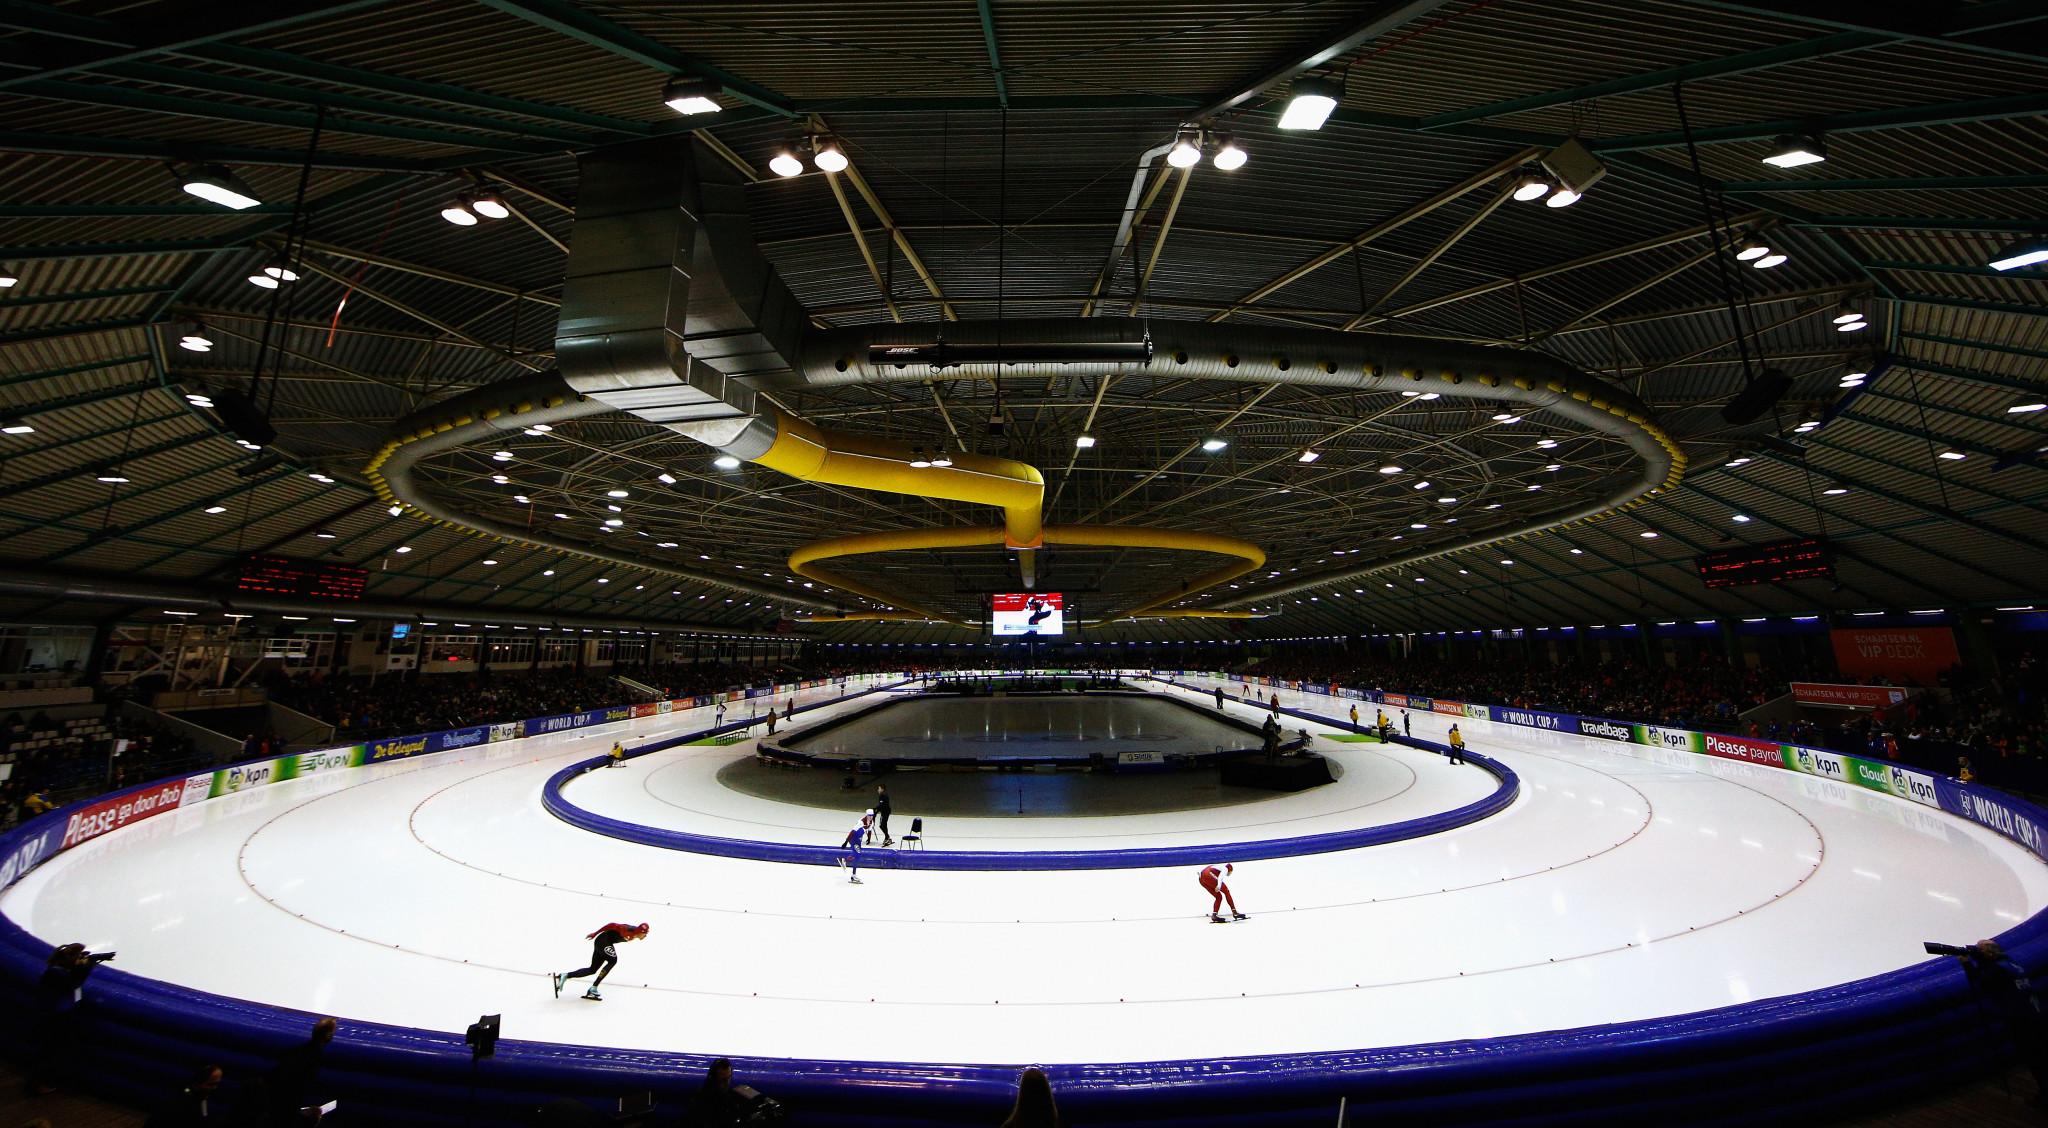 Heerenveen provisionally awarded 2023 World Speed Skating Championships